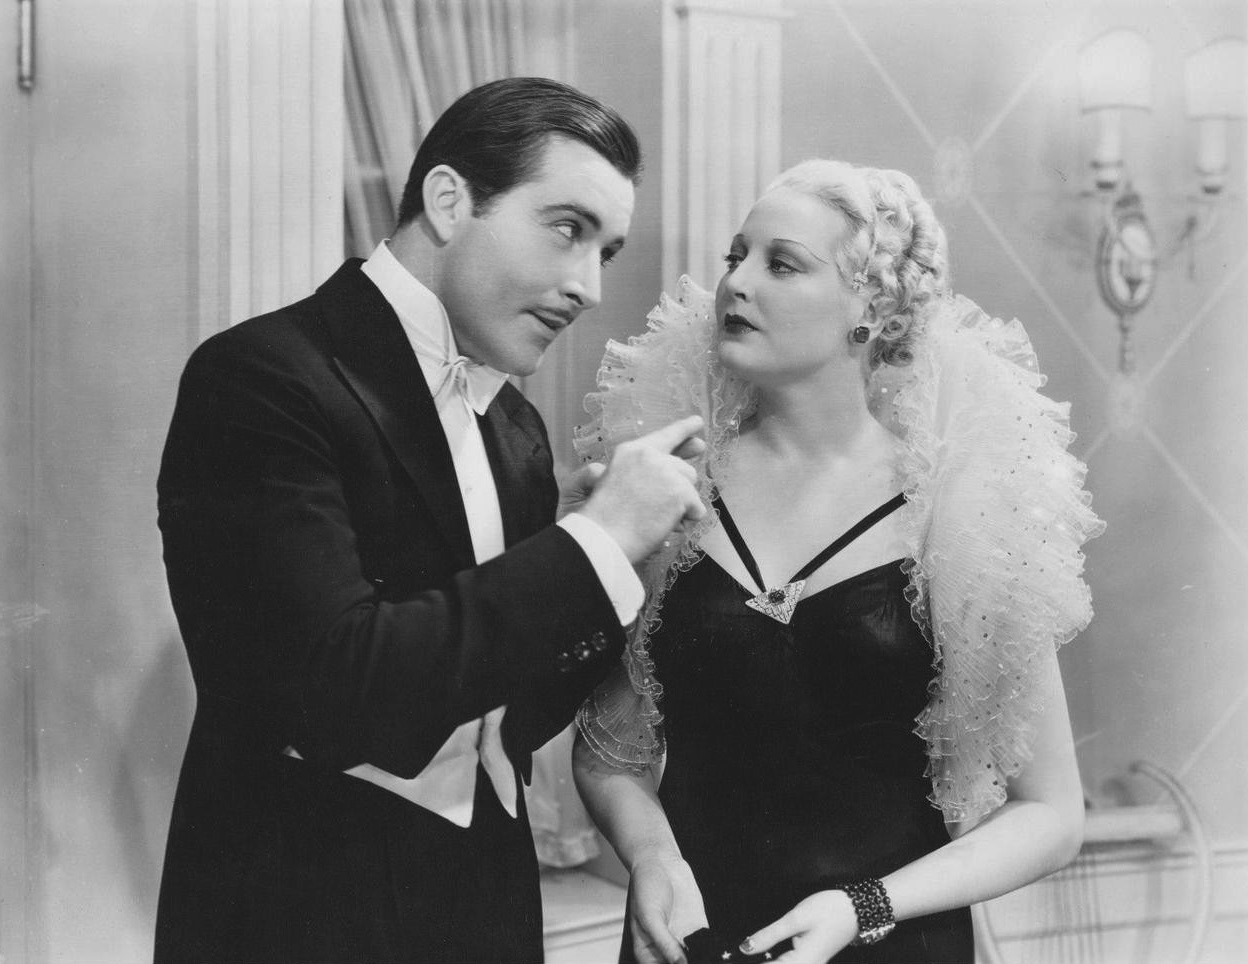 John Boles and Thelma Todd in Bottoms Up (1934)